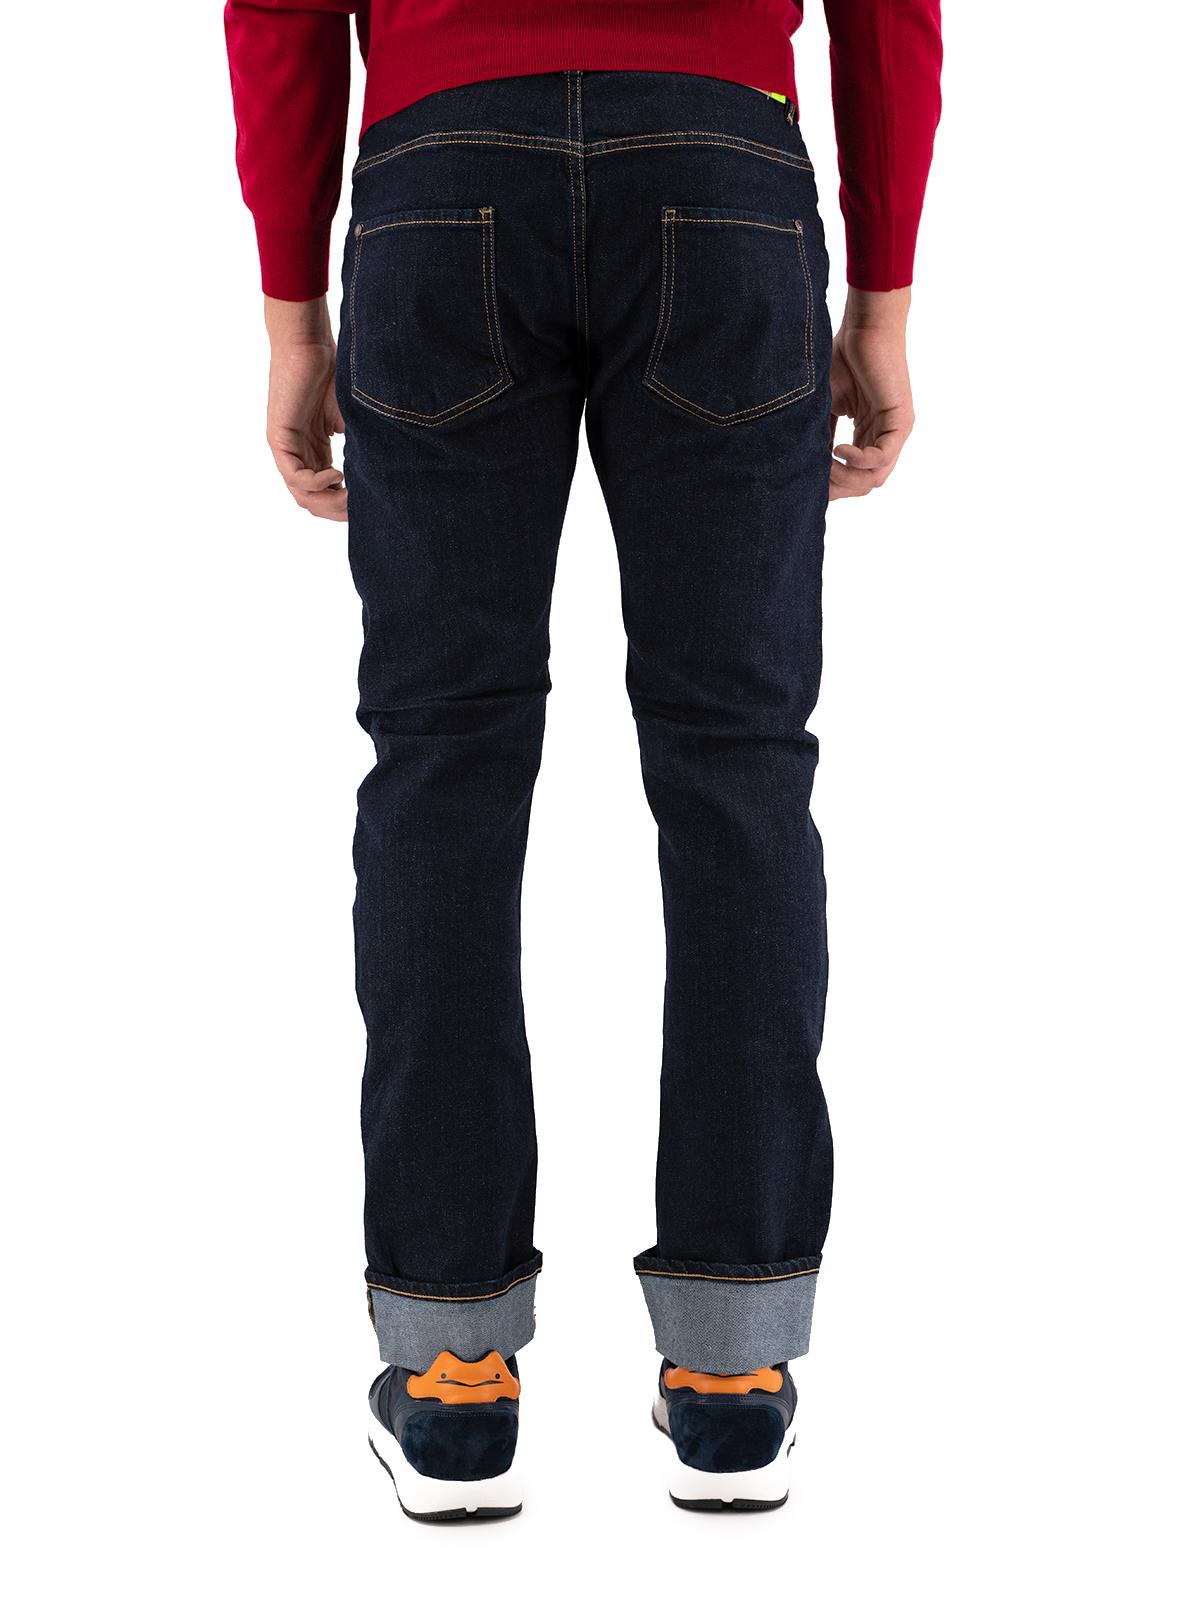 Frankie Morello Jeans FMCF9188JE